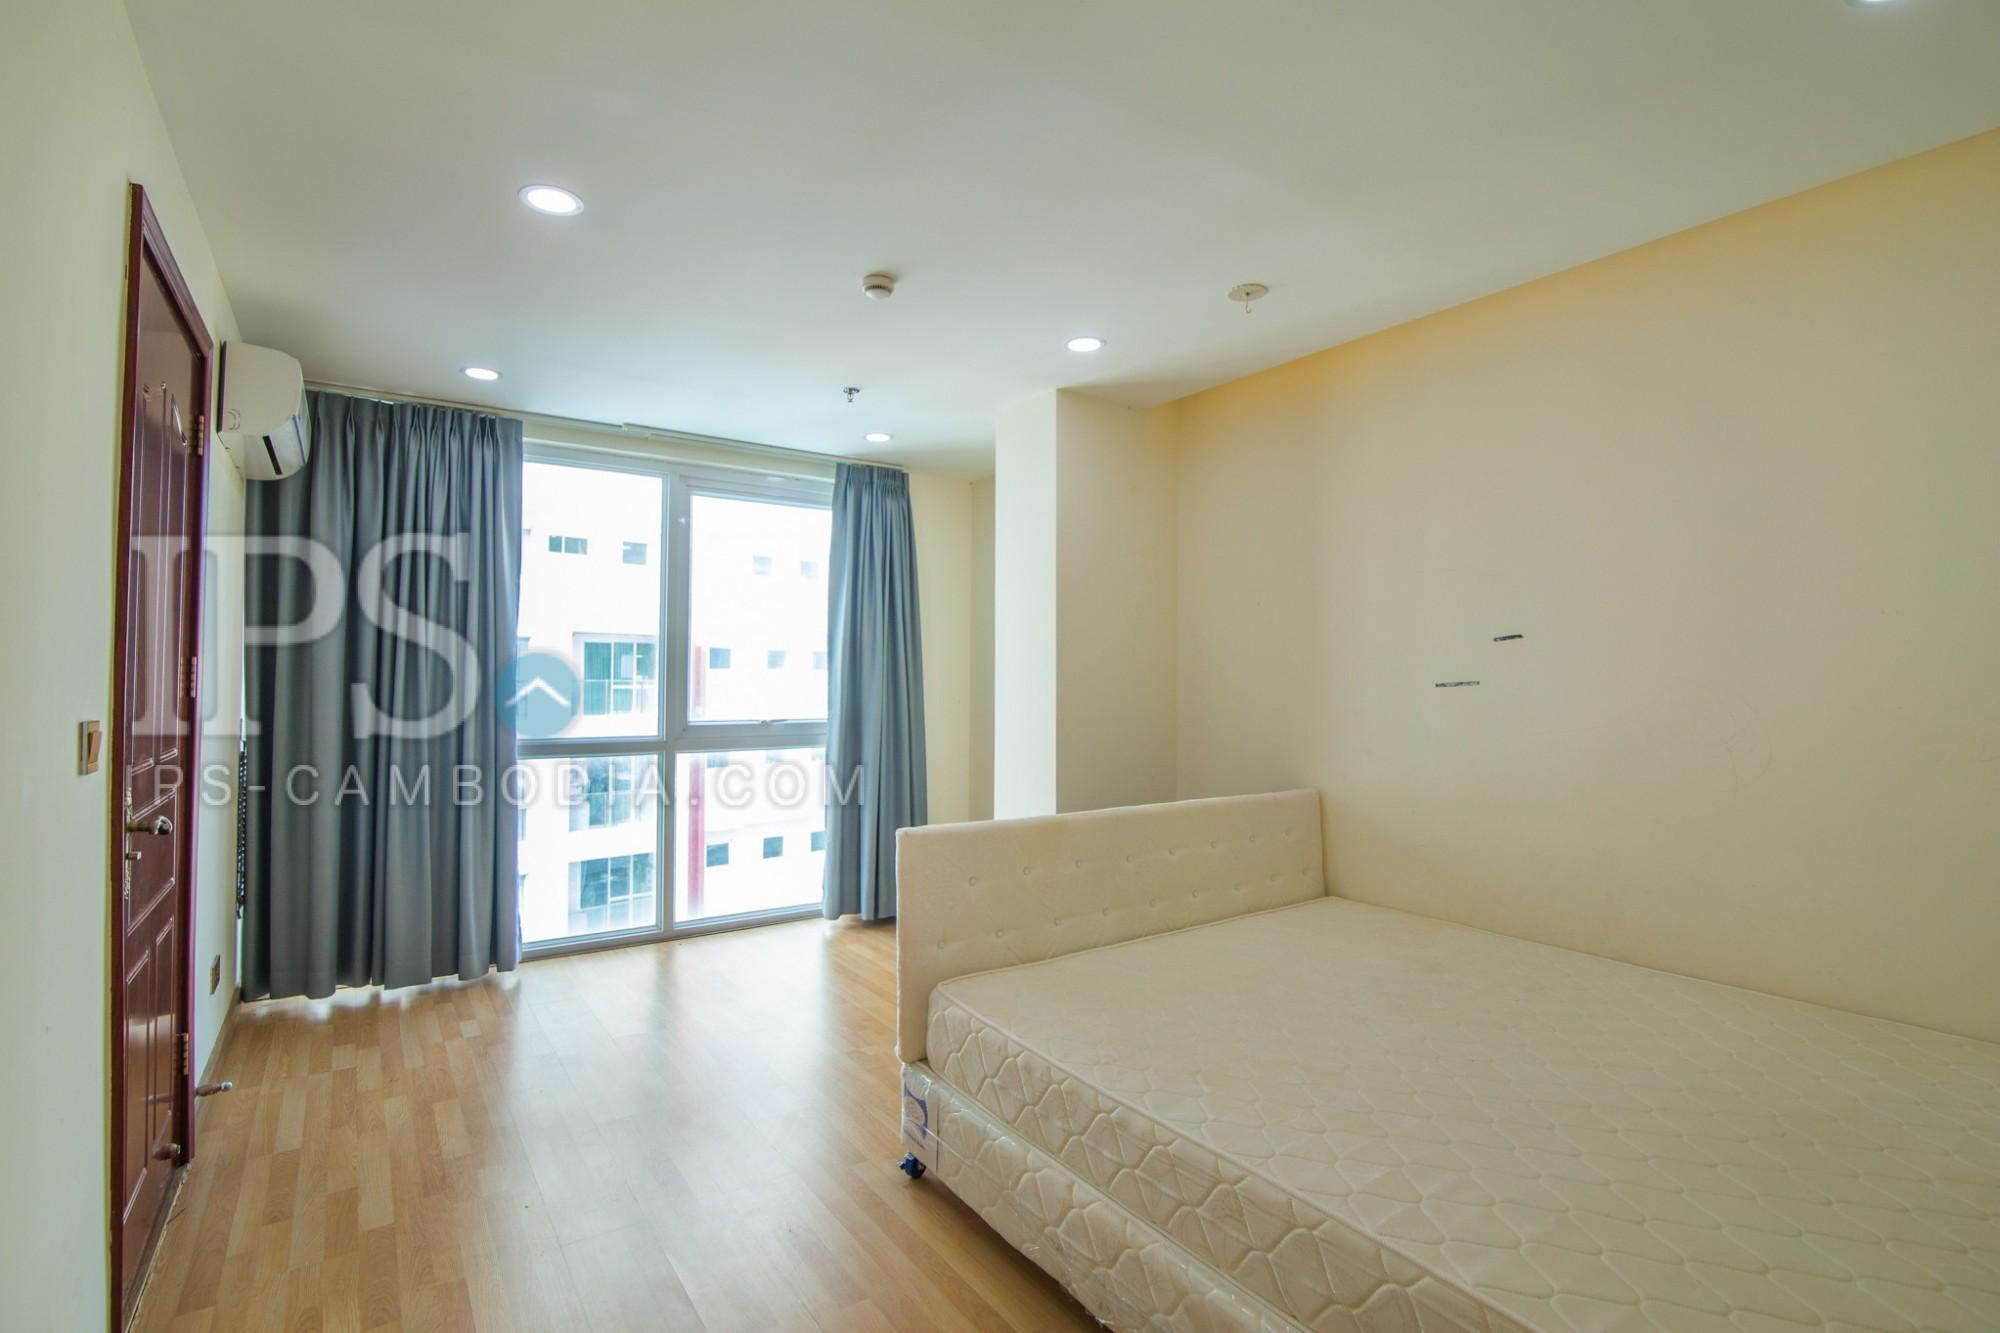 1 Bedroom Condo For Sale - Olympia City, Phnom Penh